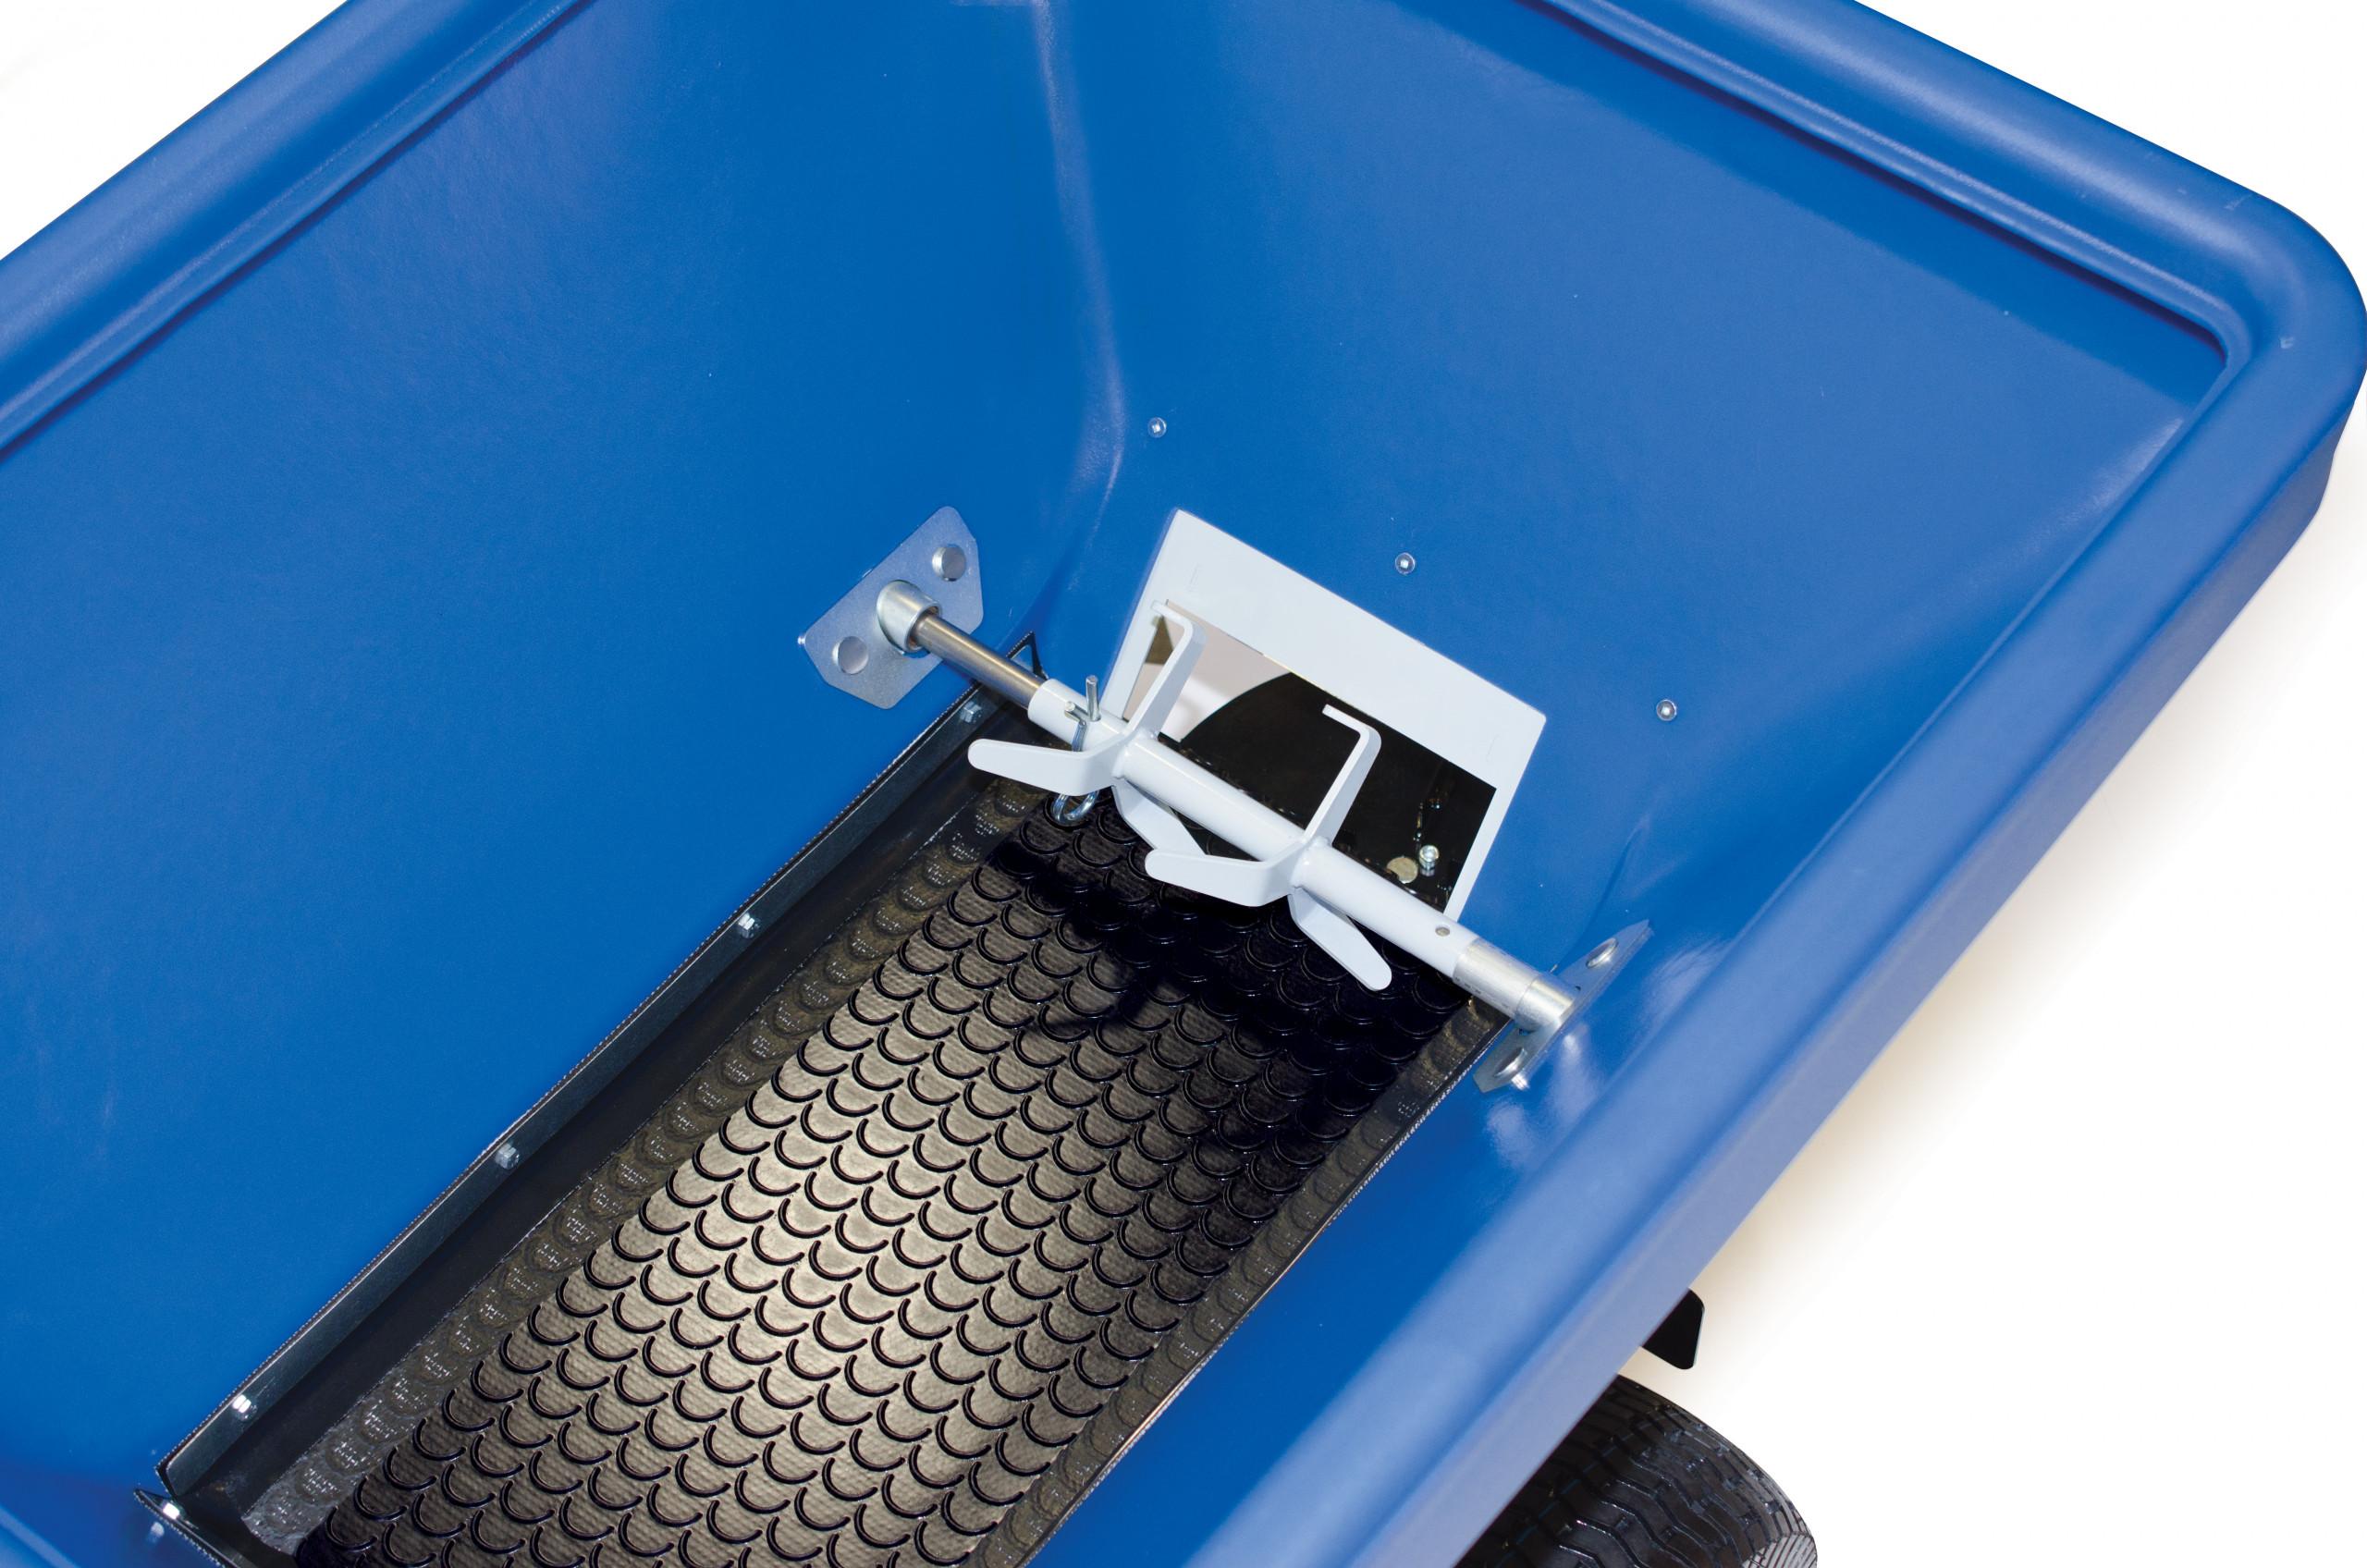 ECO 150 inside upper view with corkscrew agitator